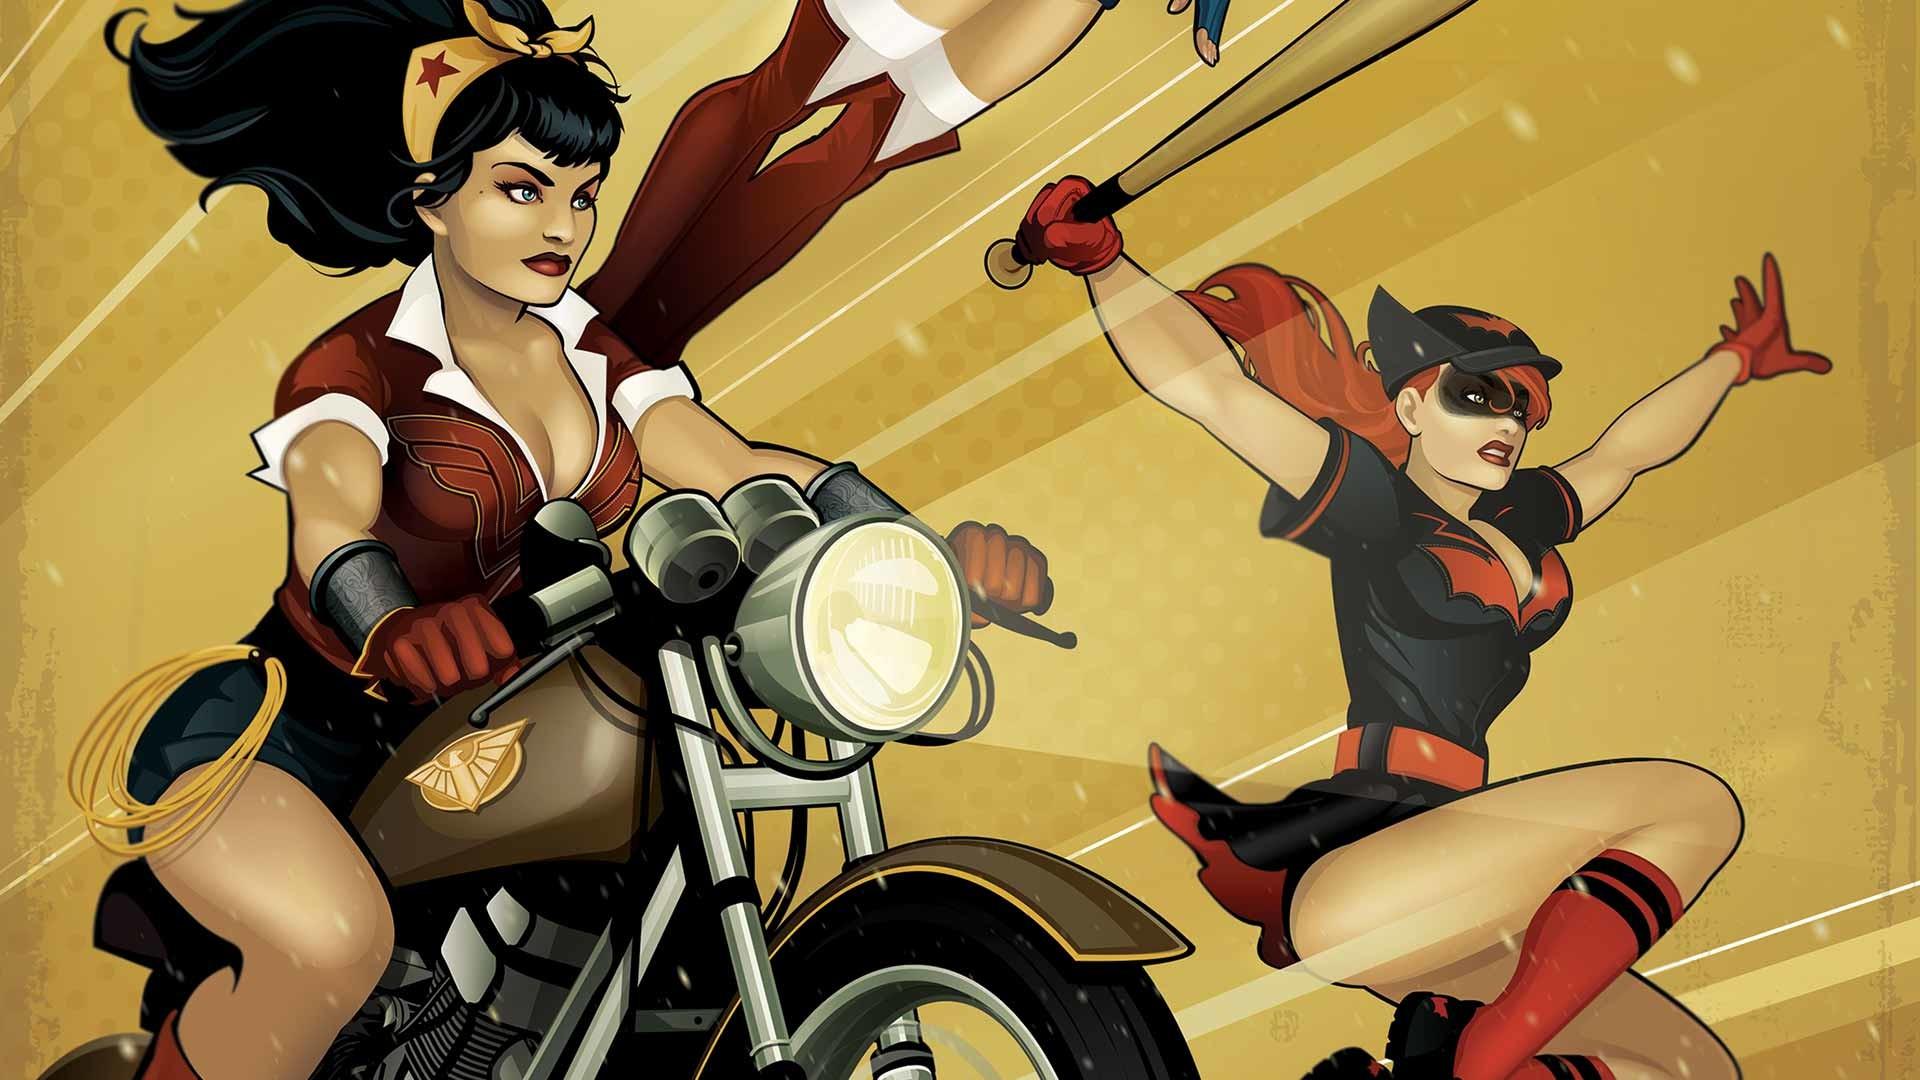 Res: 1920x1080, Comics - Bombshells DC Bombshells Wonderwoman Batwoman Wallpaper